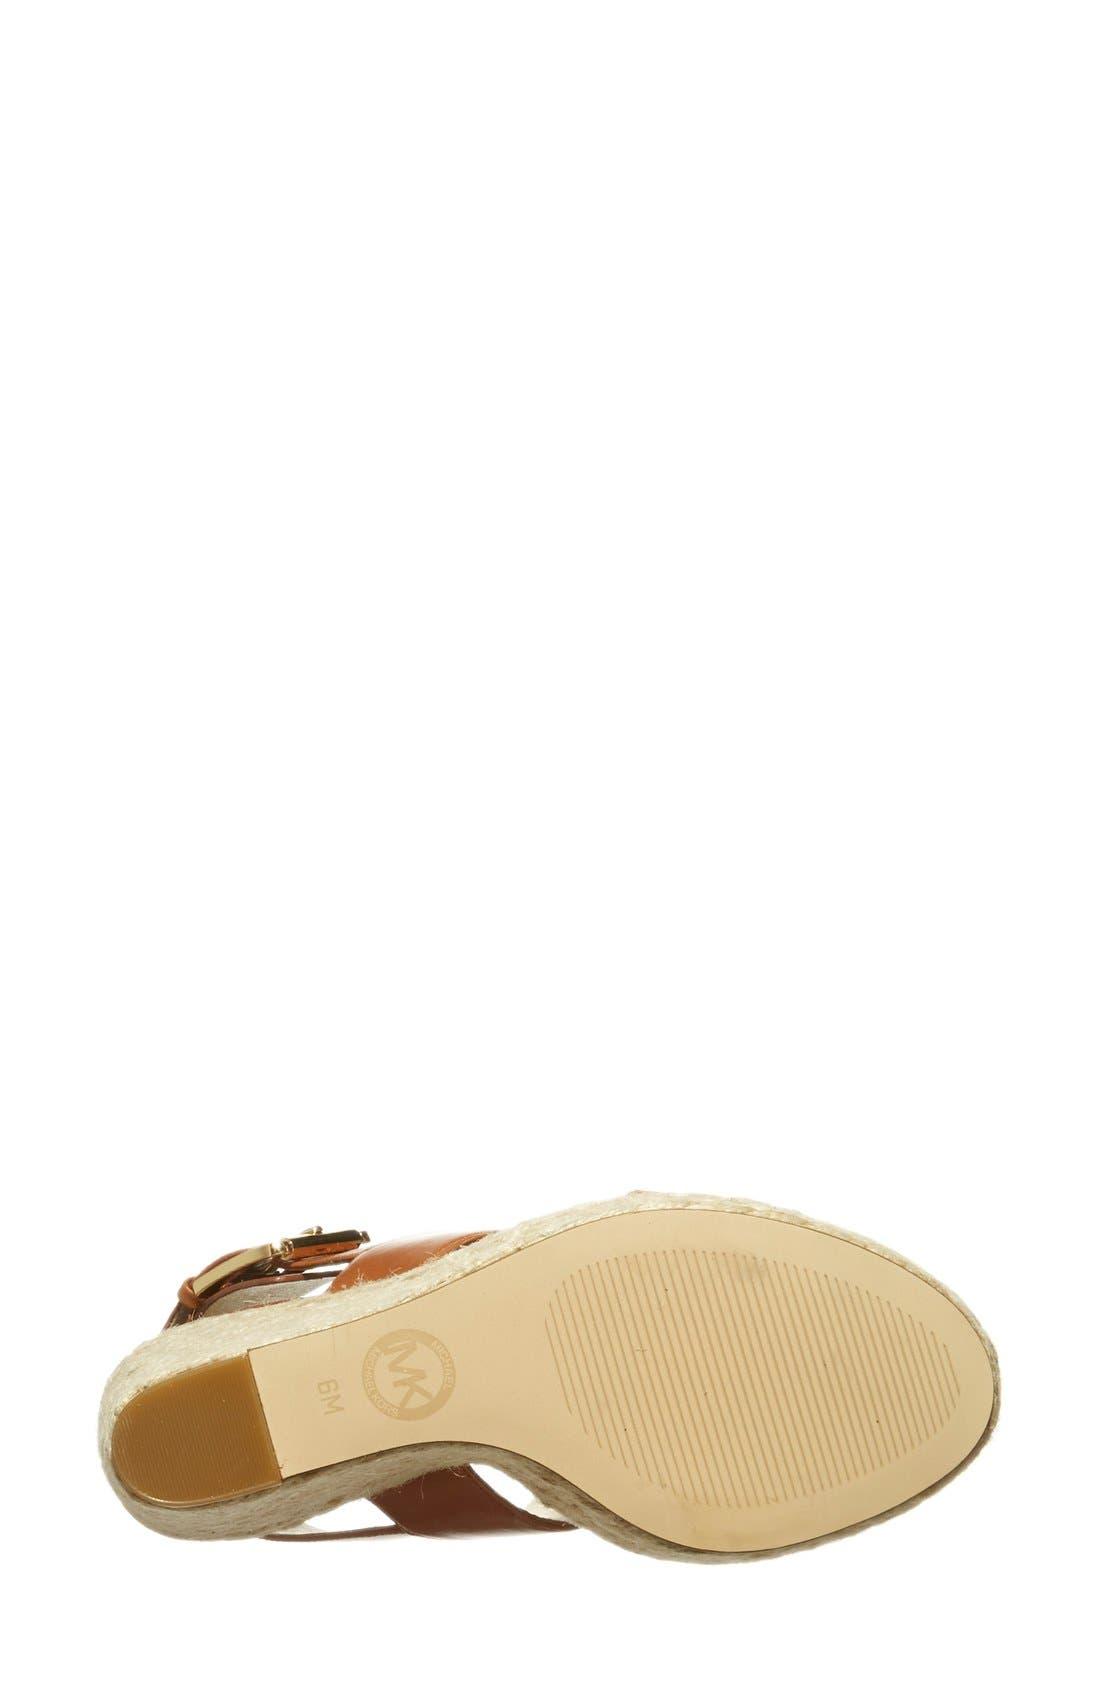 Alternate Image 4  - MICHAEL Michael Kors 'Posey' Espadrille Wedge Sandal (Women)